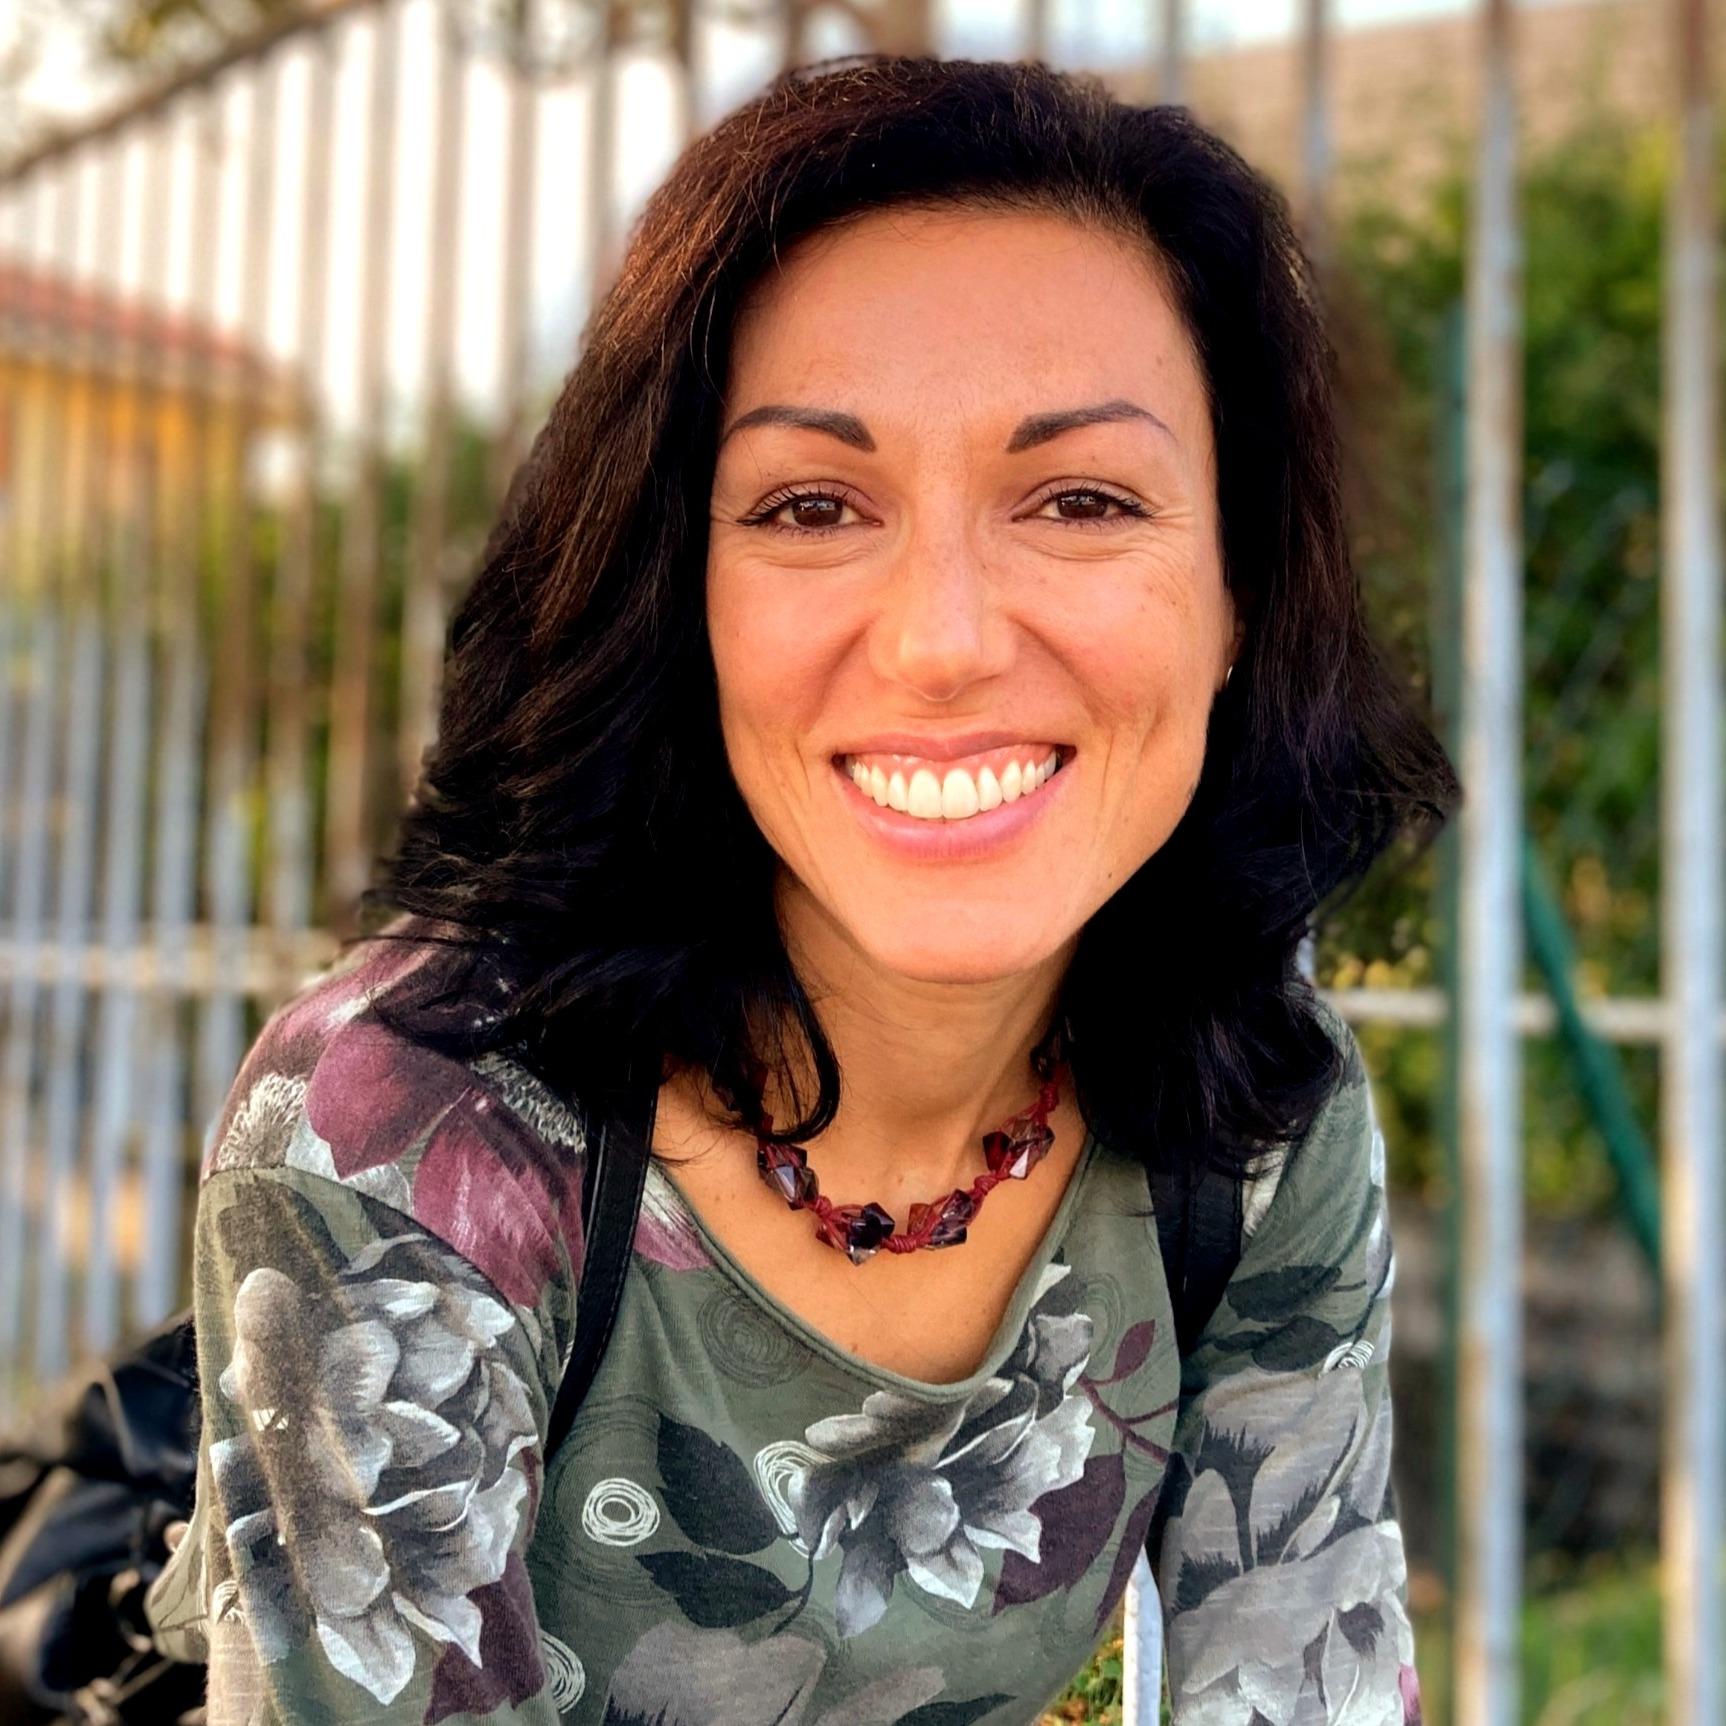 Dott.ssa Antonia Frustagli